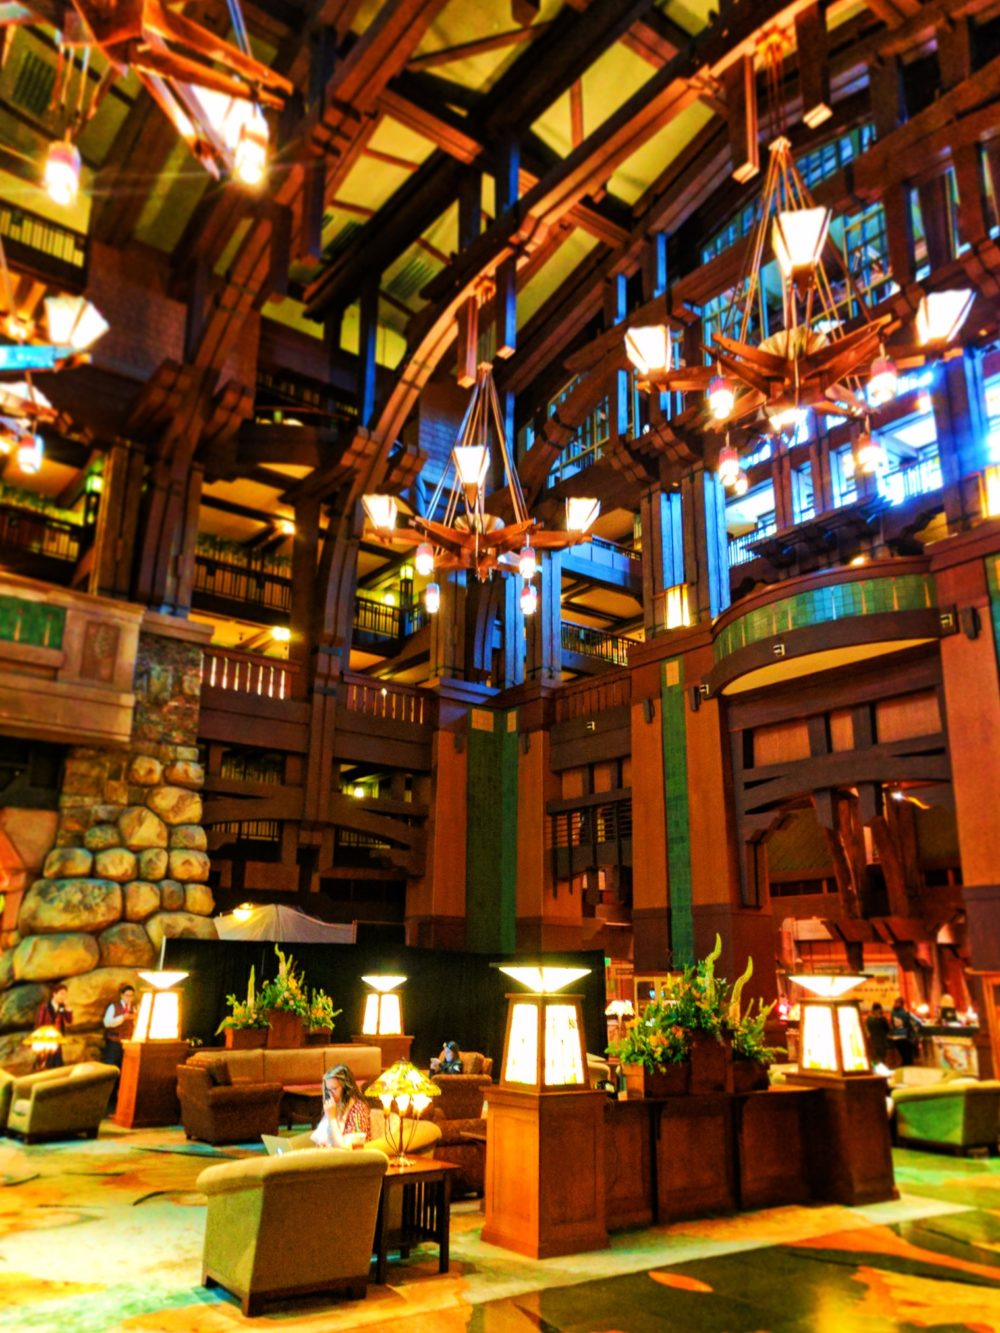 Grand Lobby of Disneys Grand Californian Hotel Disneyland 1